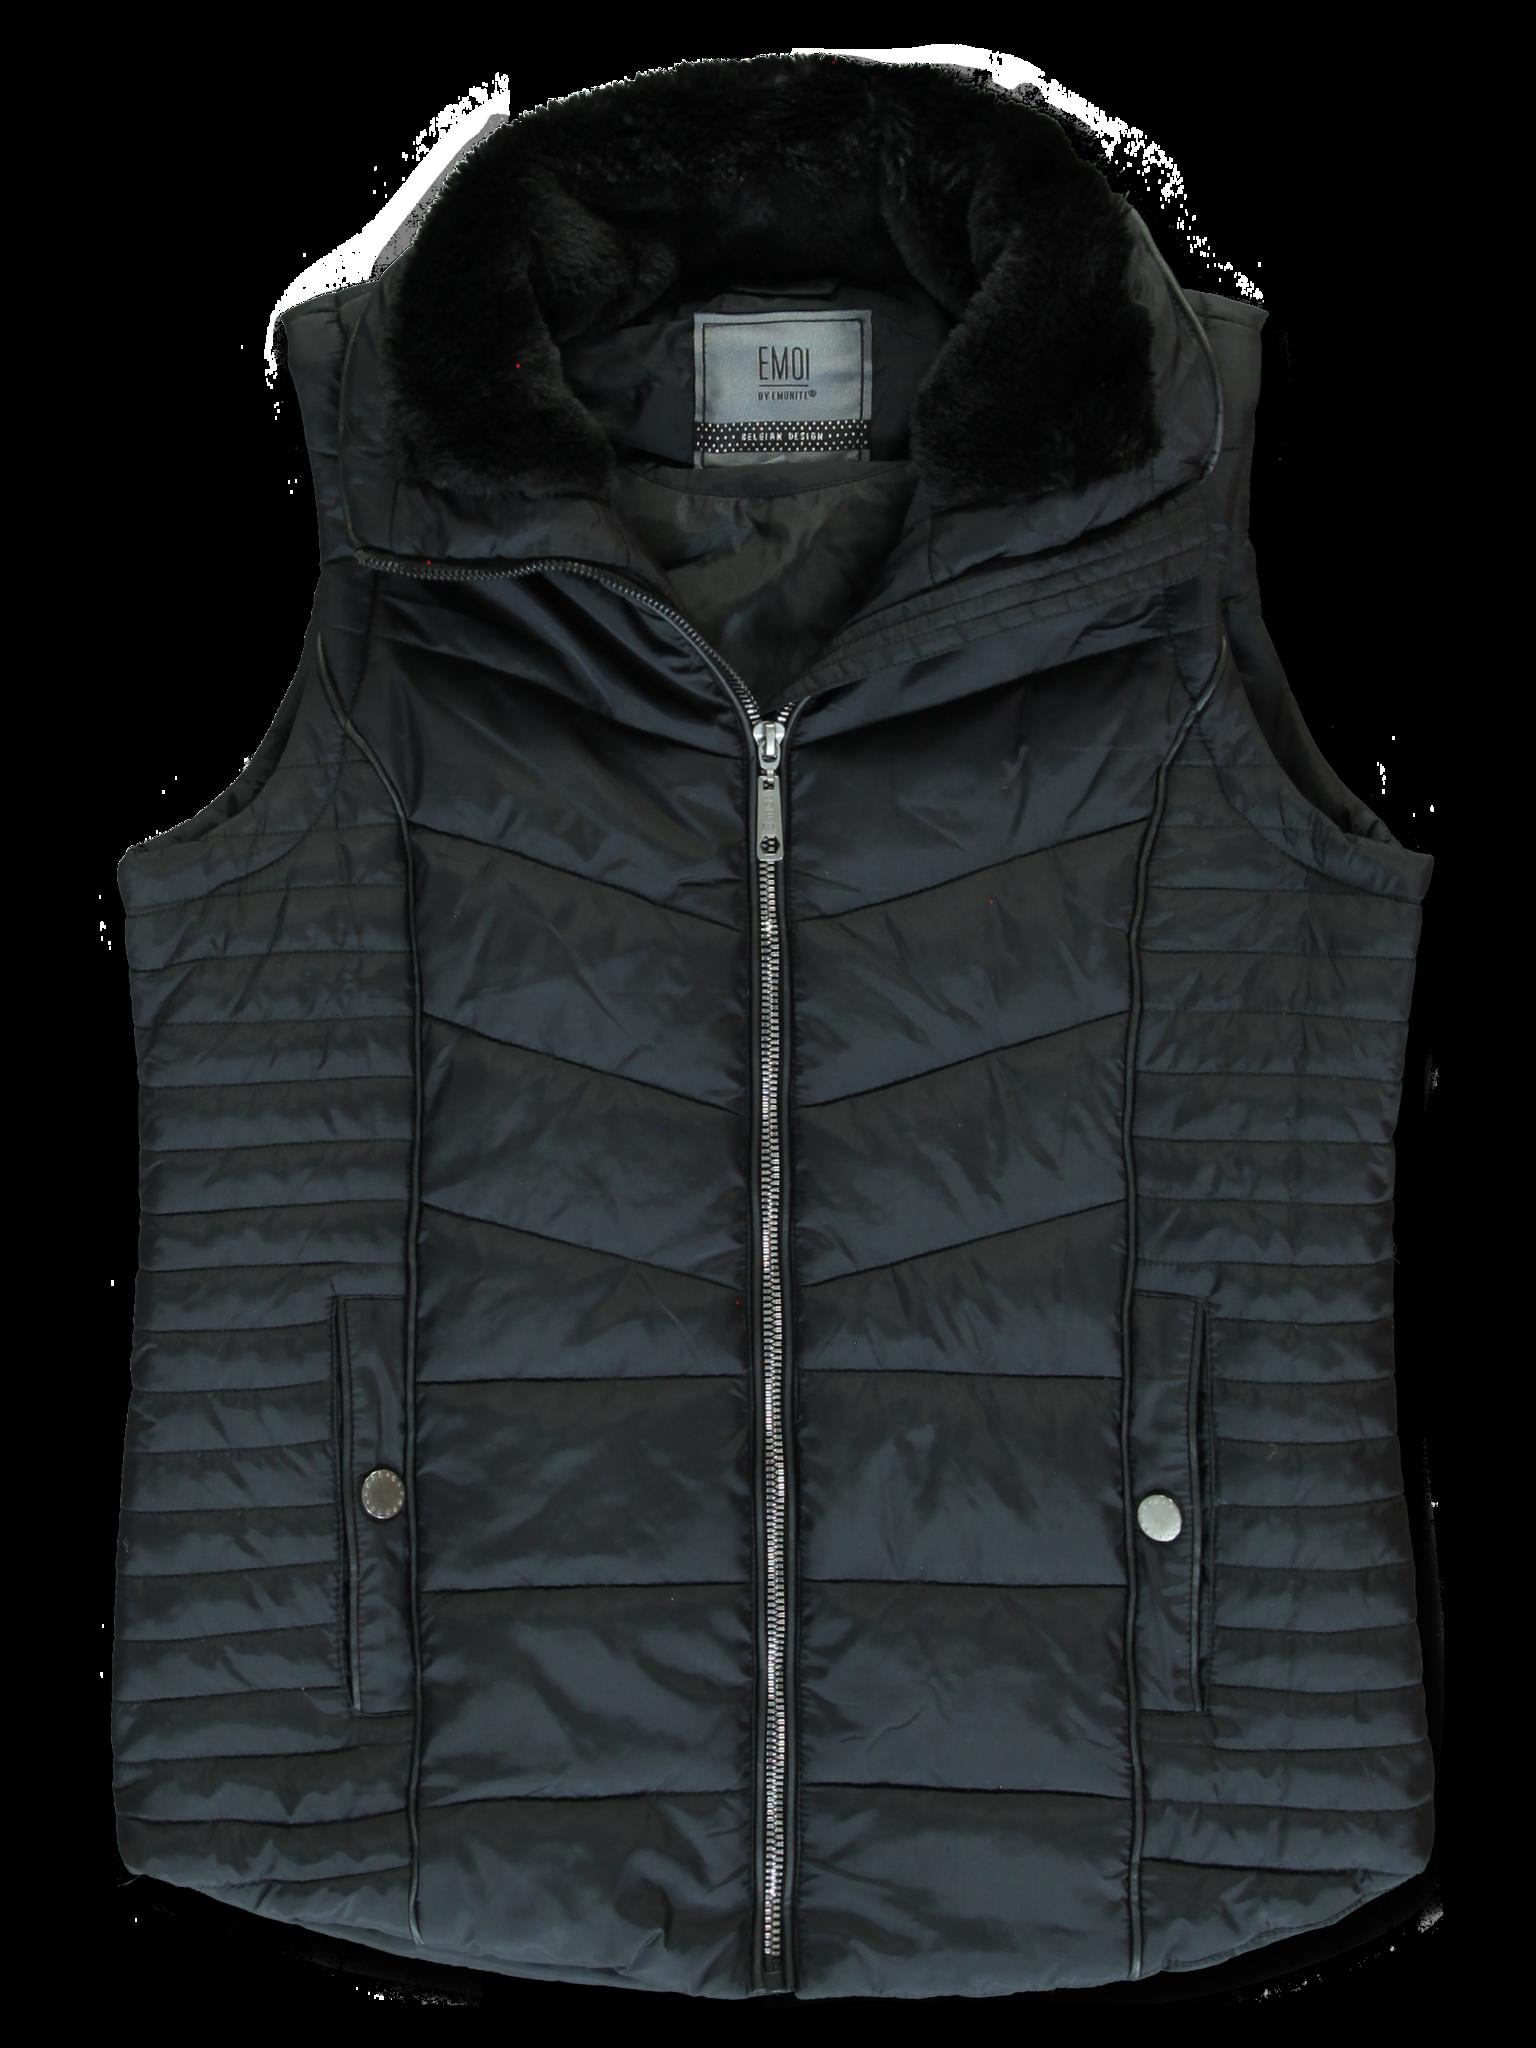 All Brands | Winterproducts Ladies | Bodywarmer | 12 pcs/box